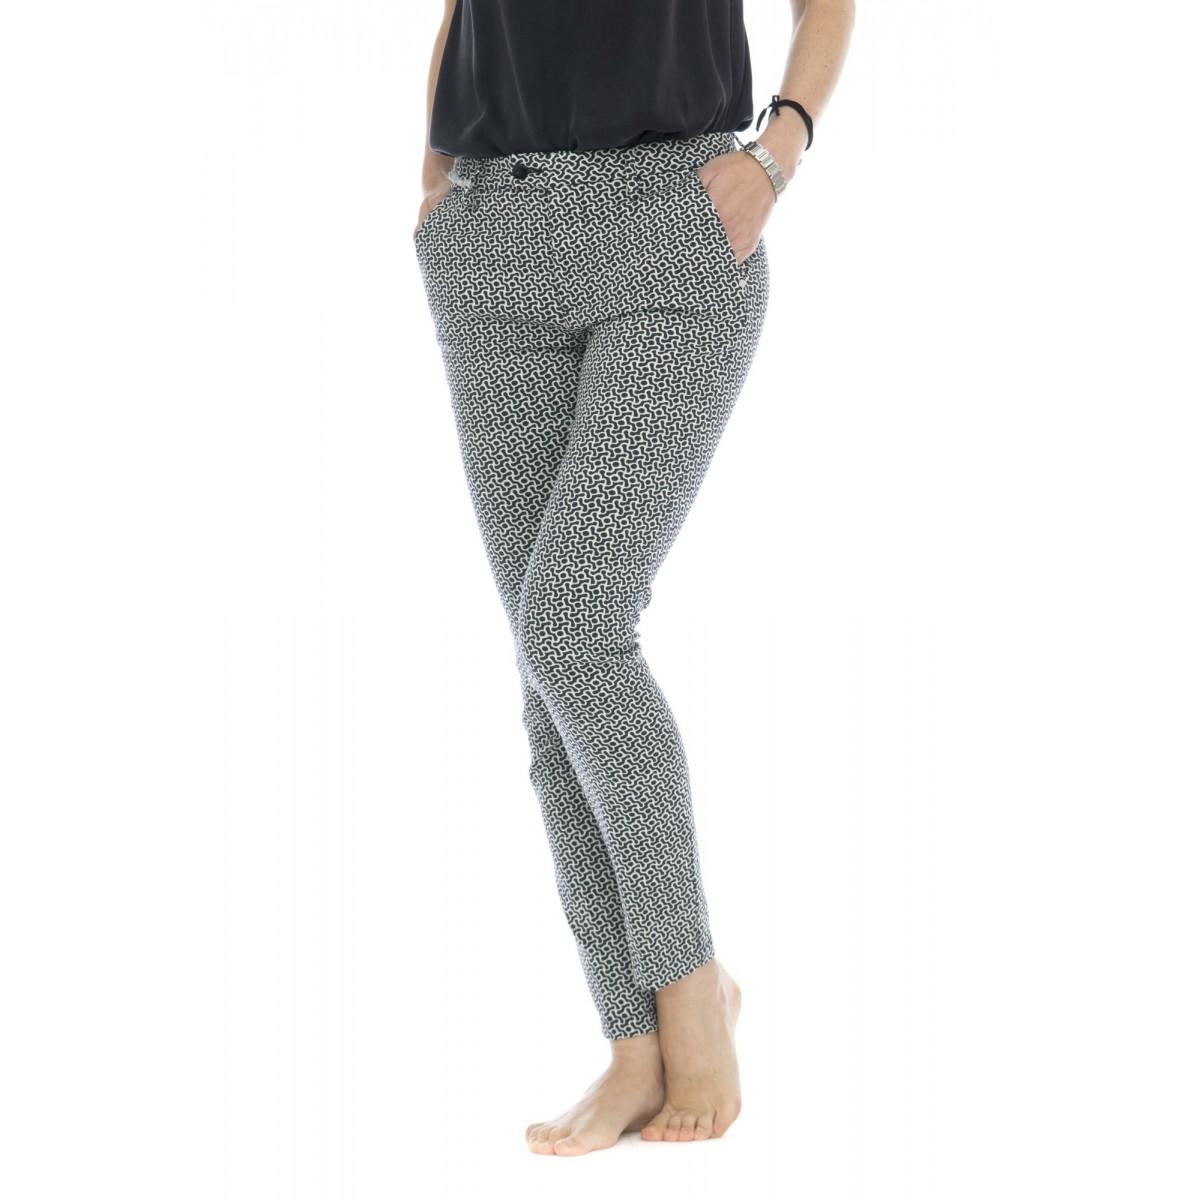 Pantaloni - Janet 3092 jersey stampato